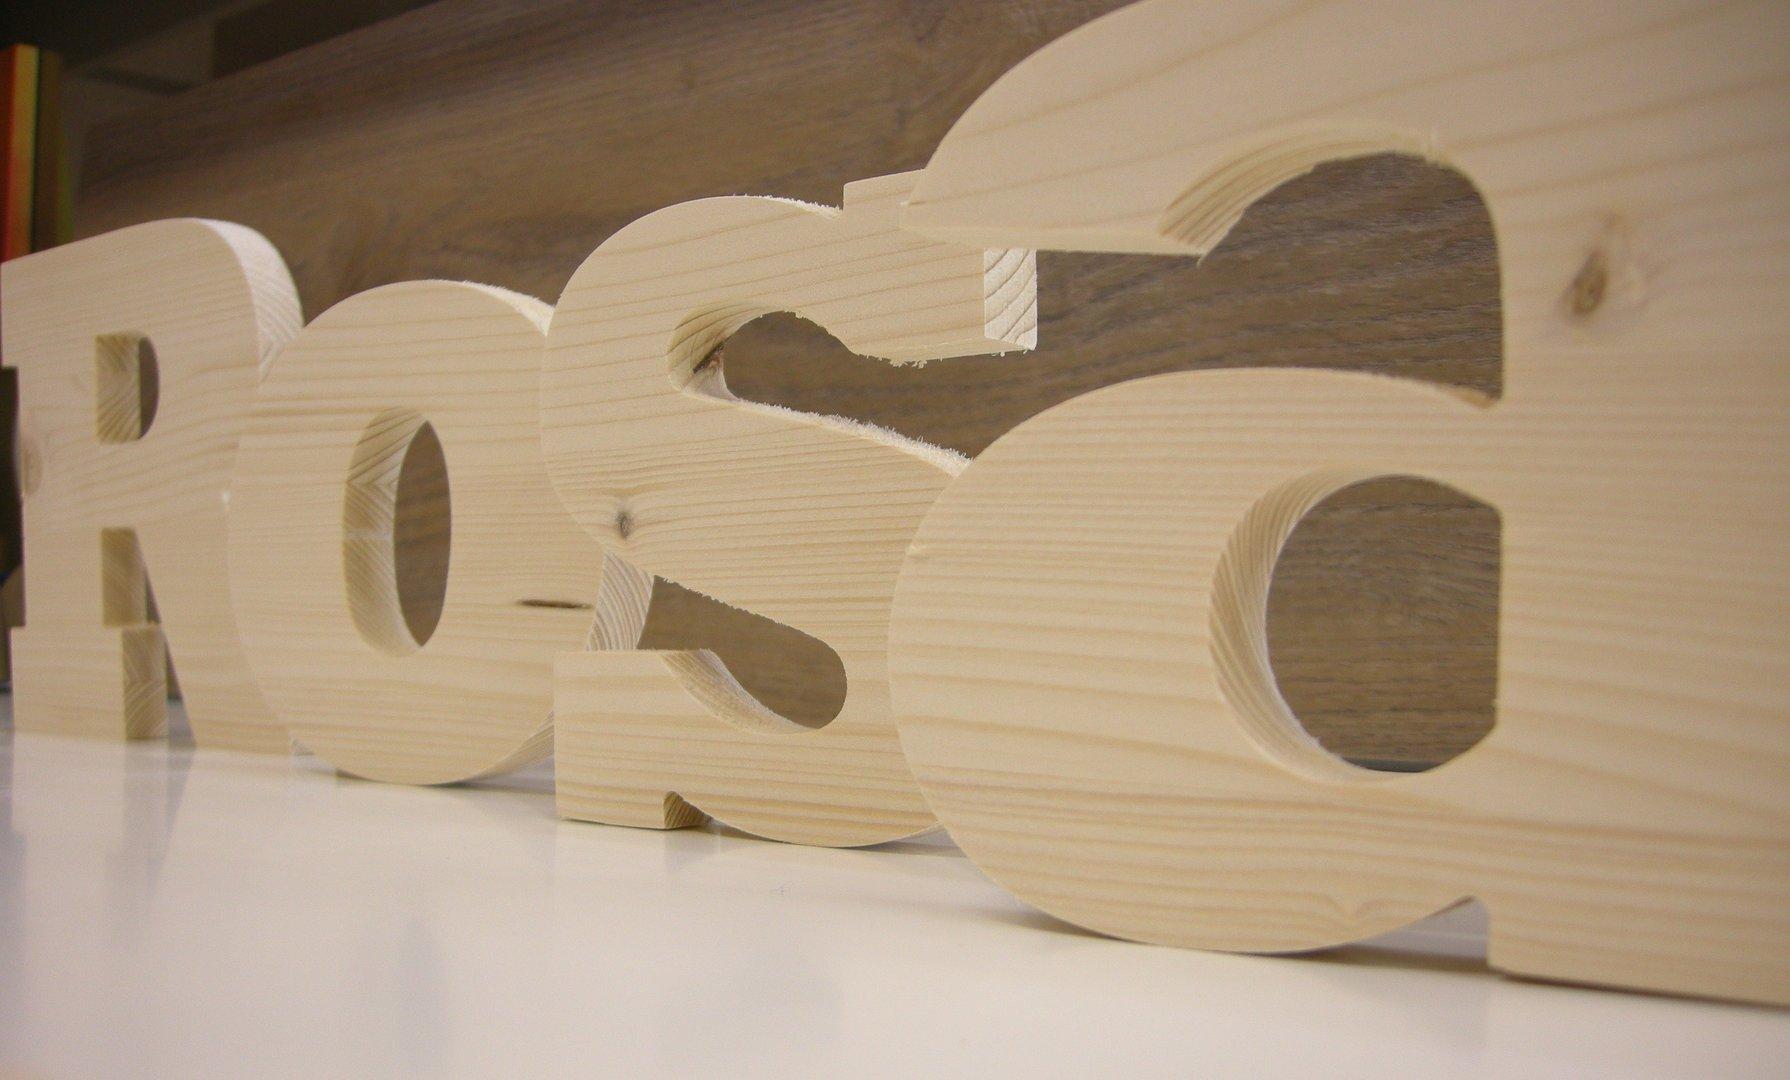 Letras madera maciza 40 cm gla de roure shop telf - Casa letras madera ...